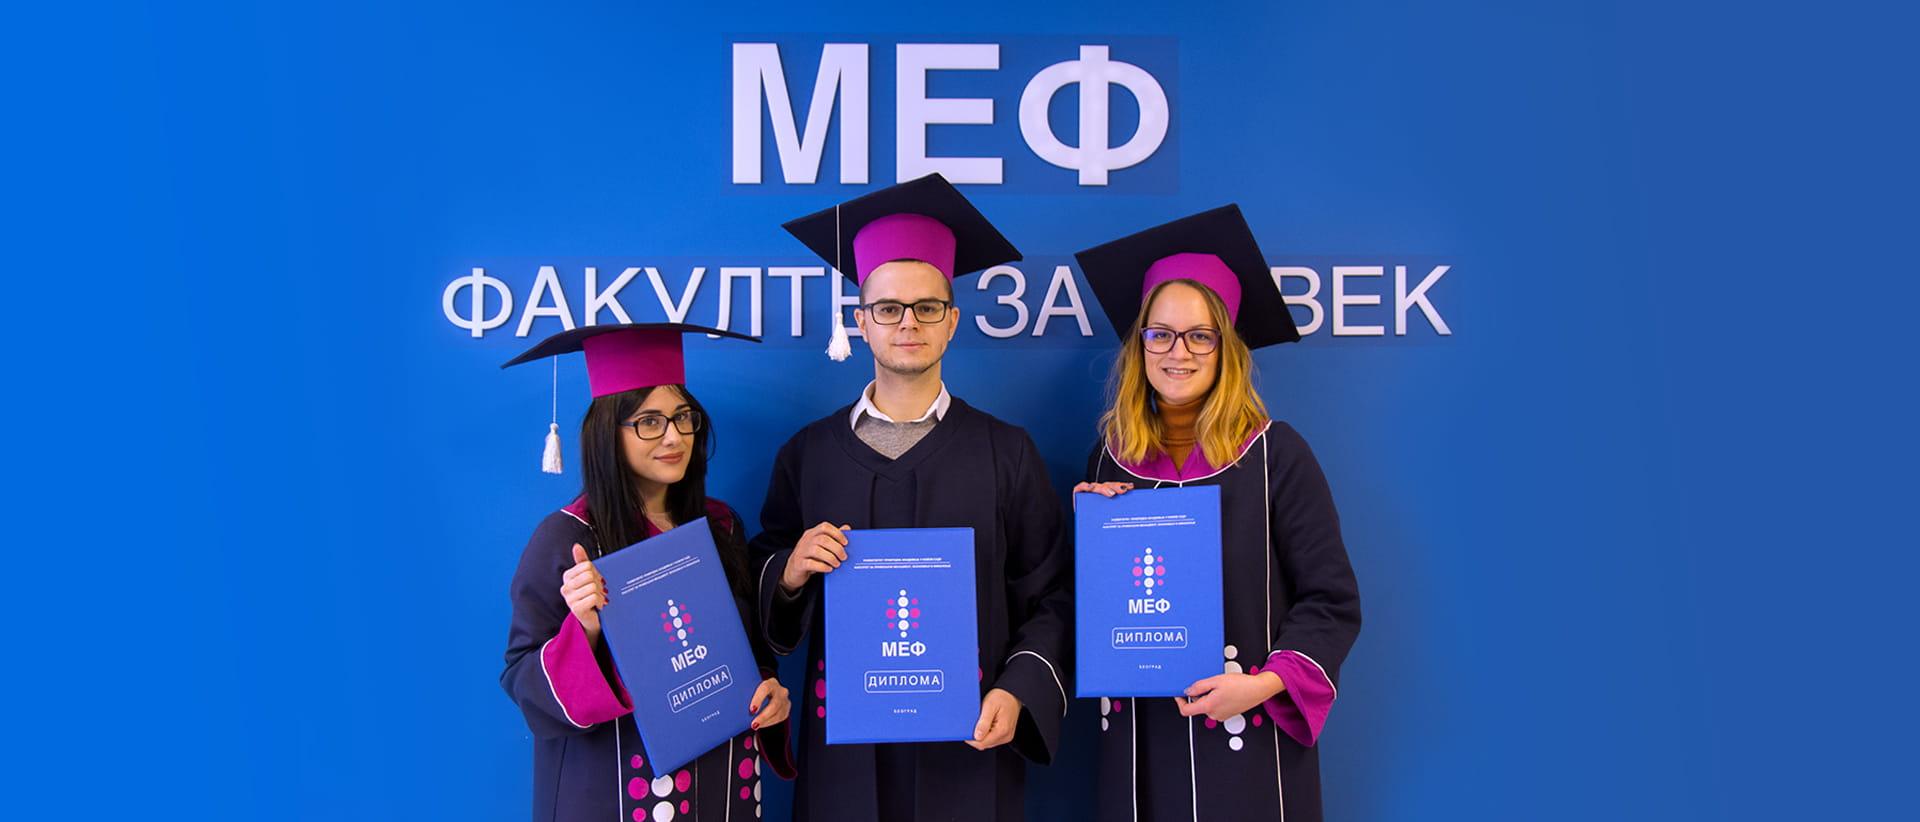 MEF fakultet - Alumni klub